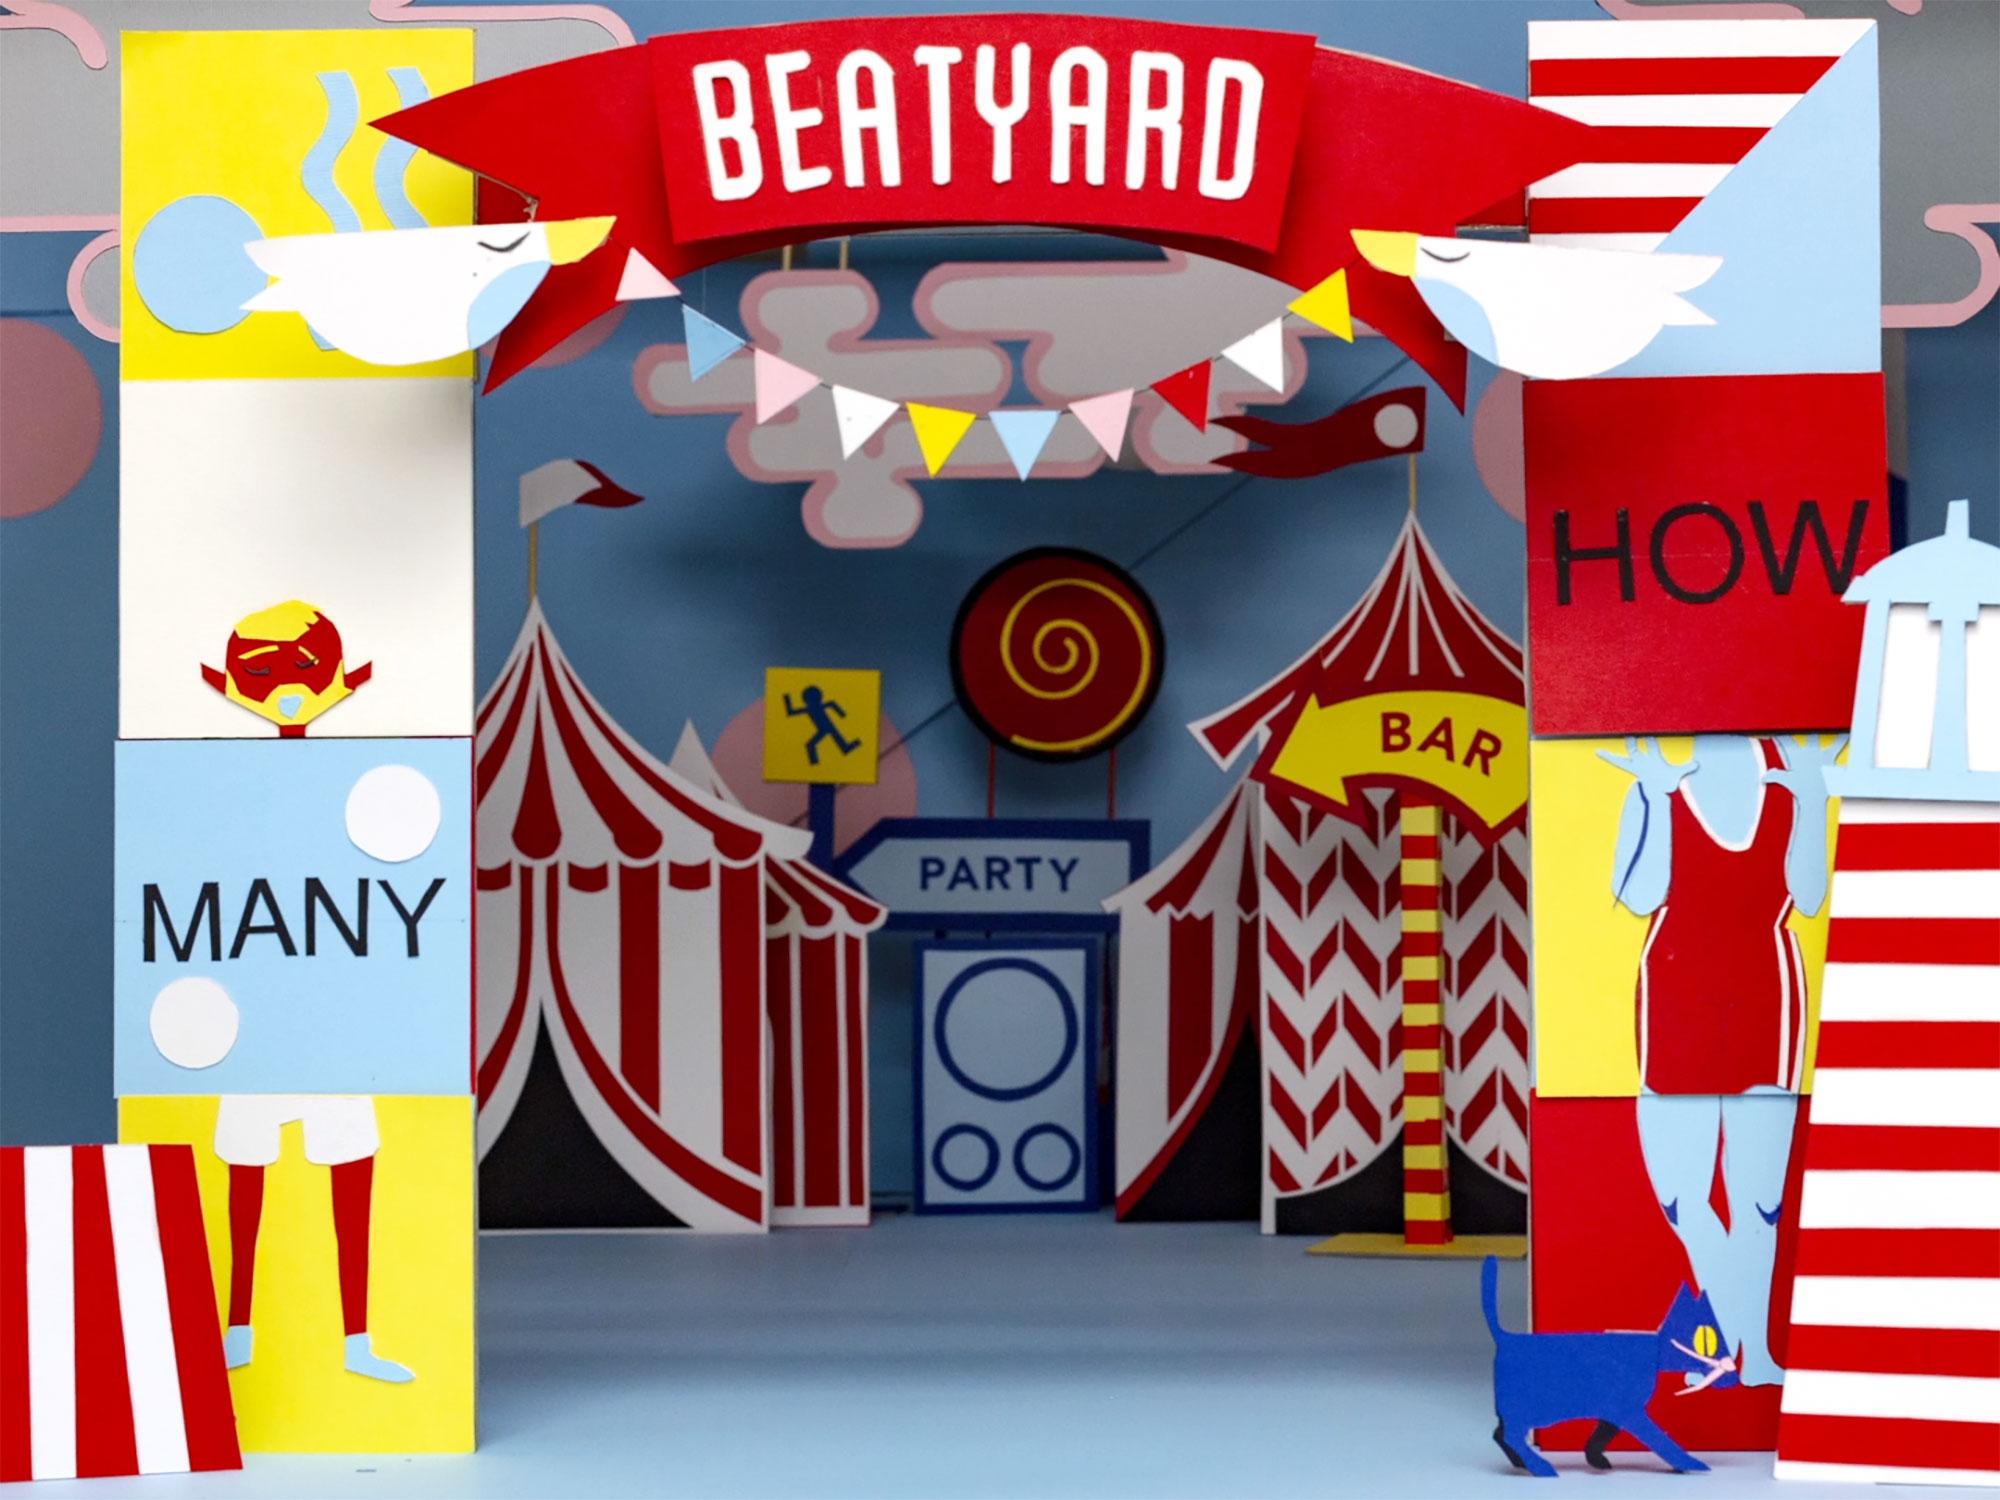 Cover image: Beatyard 018